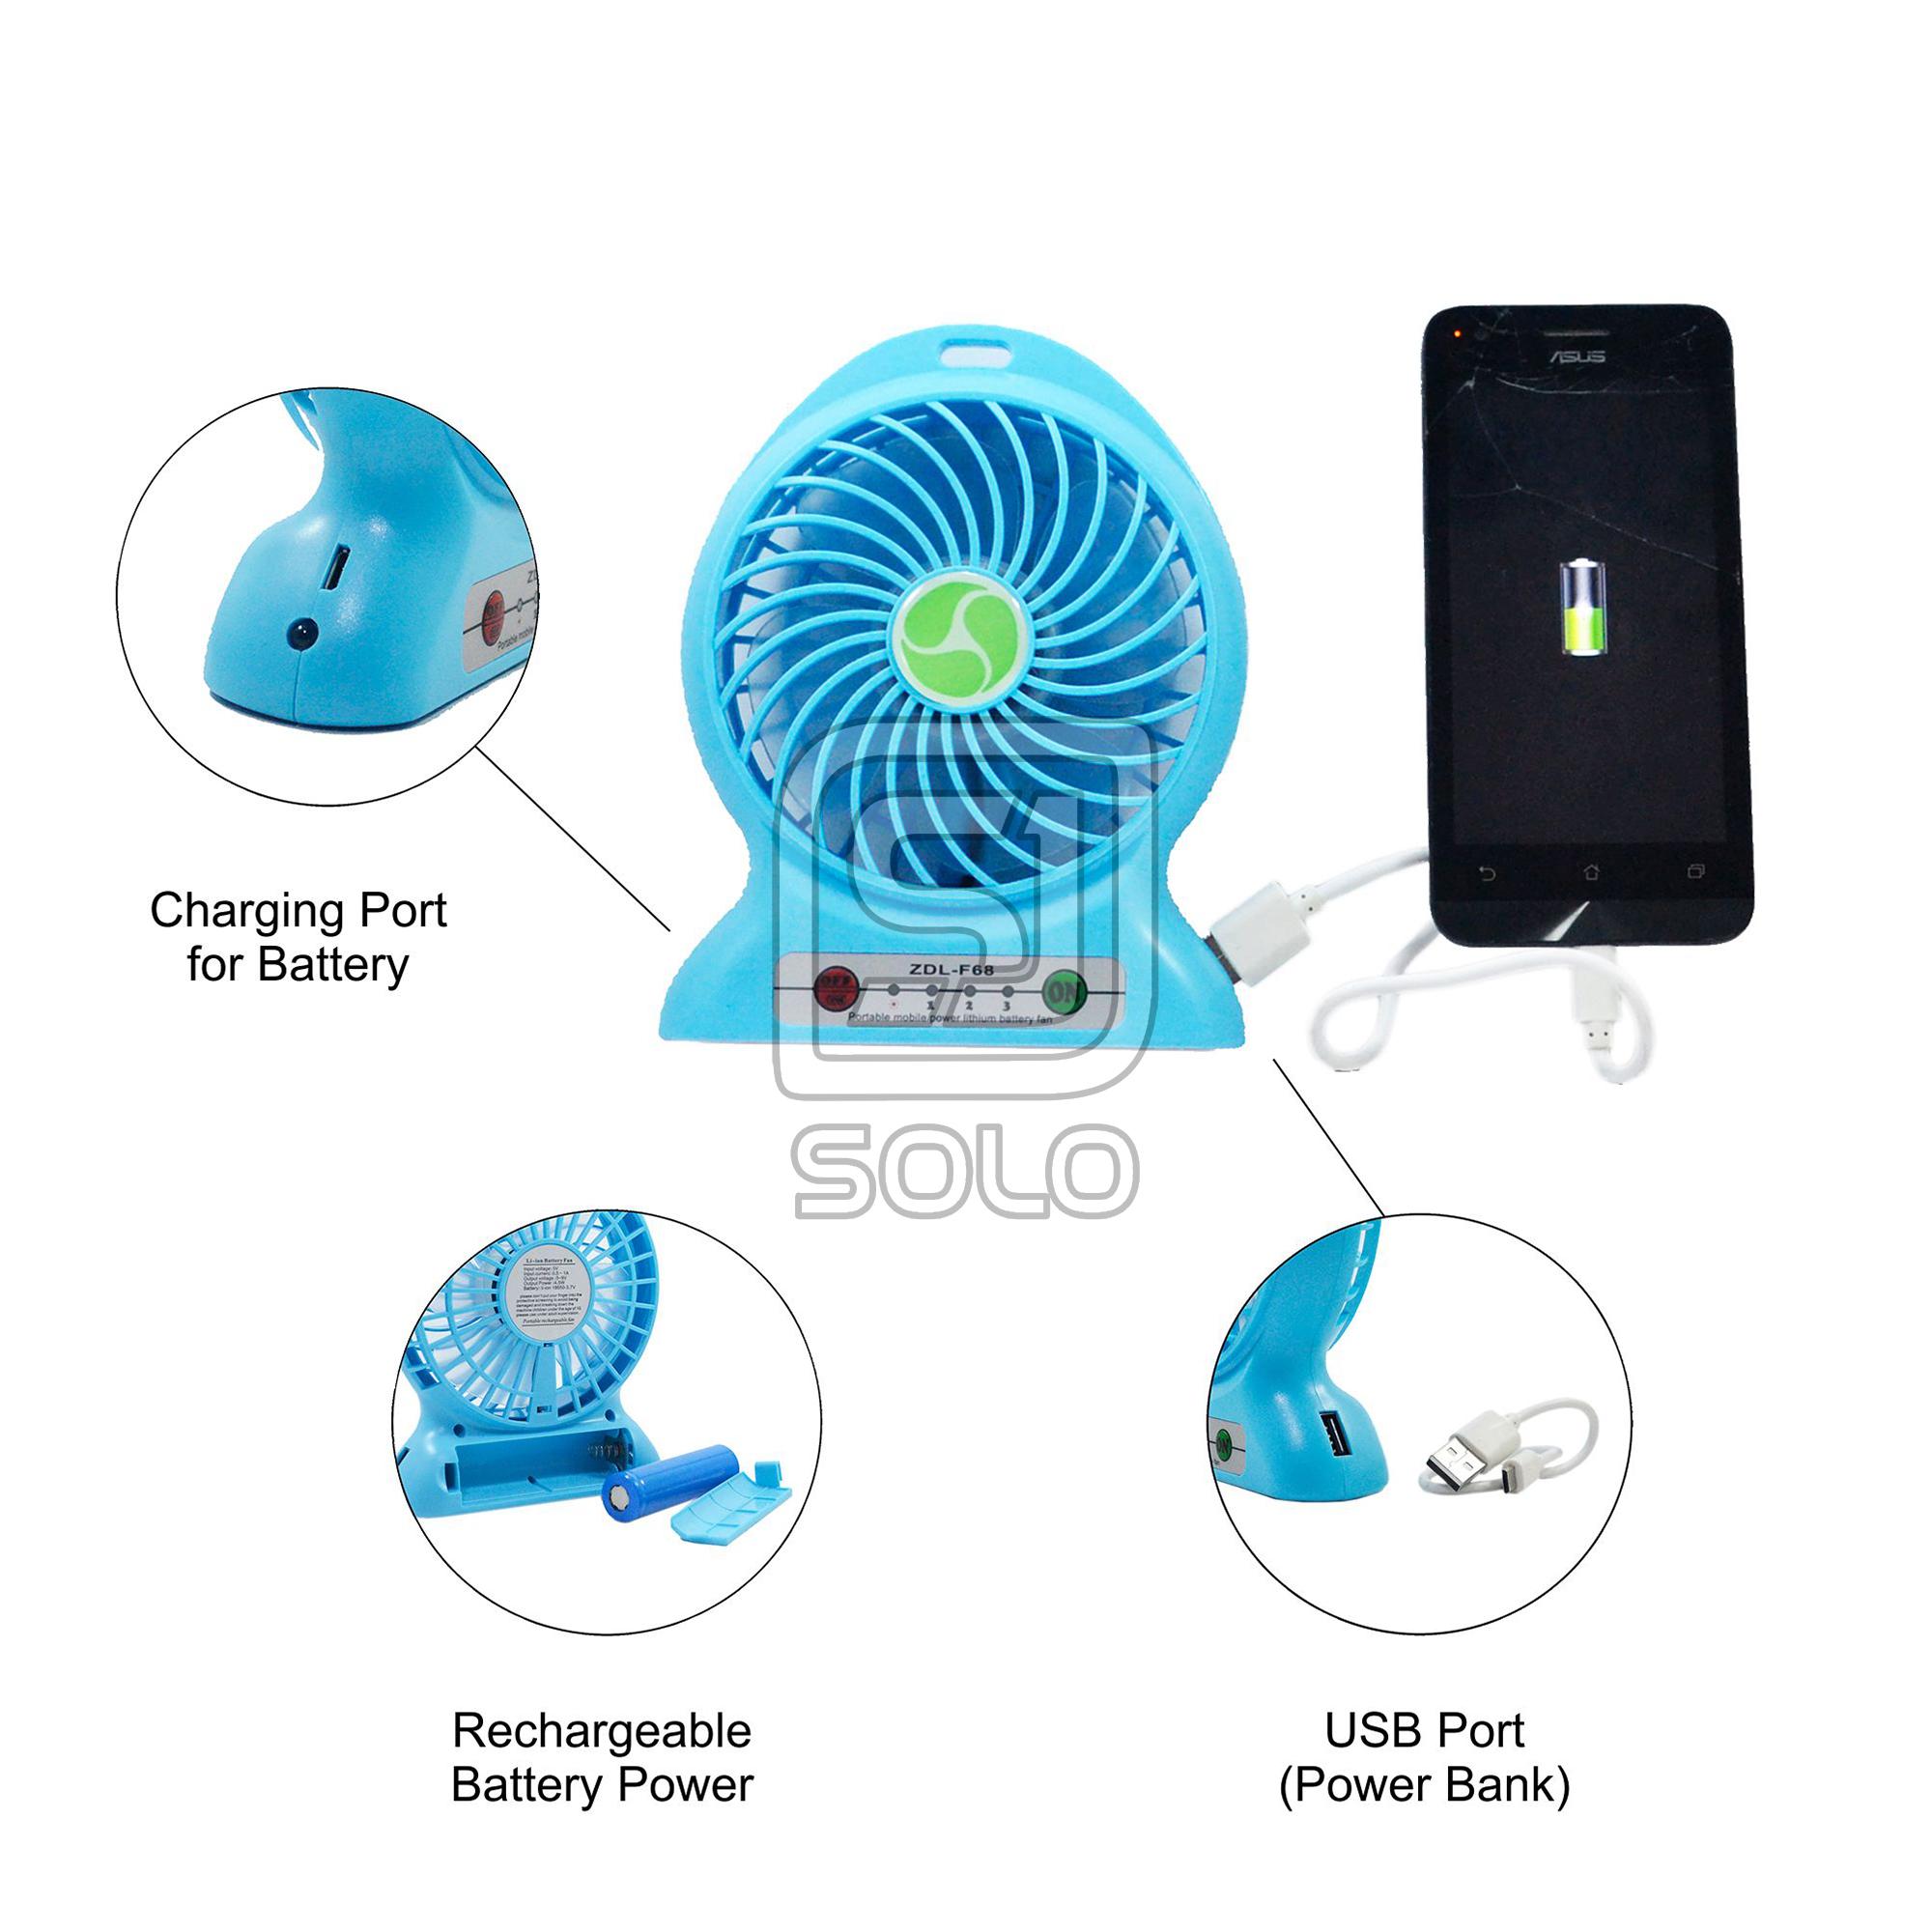 Jual Kipas Angin Mini Usb Portable Cooling Fan Powerbank 2 In 1 Recharger